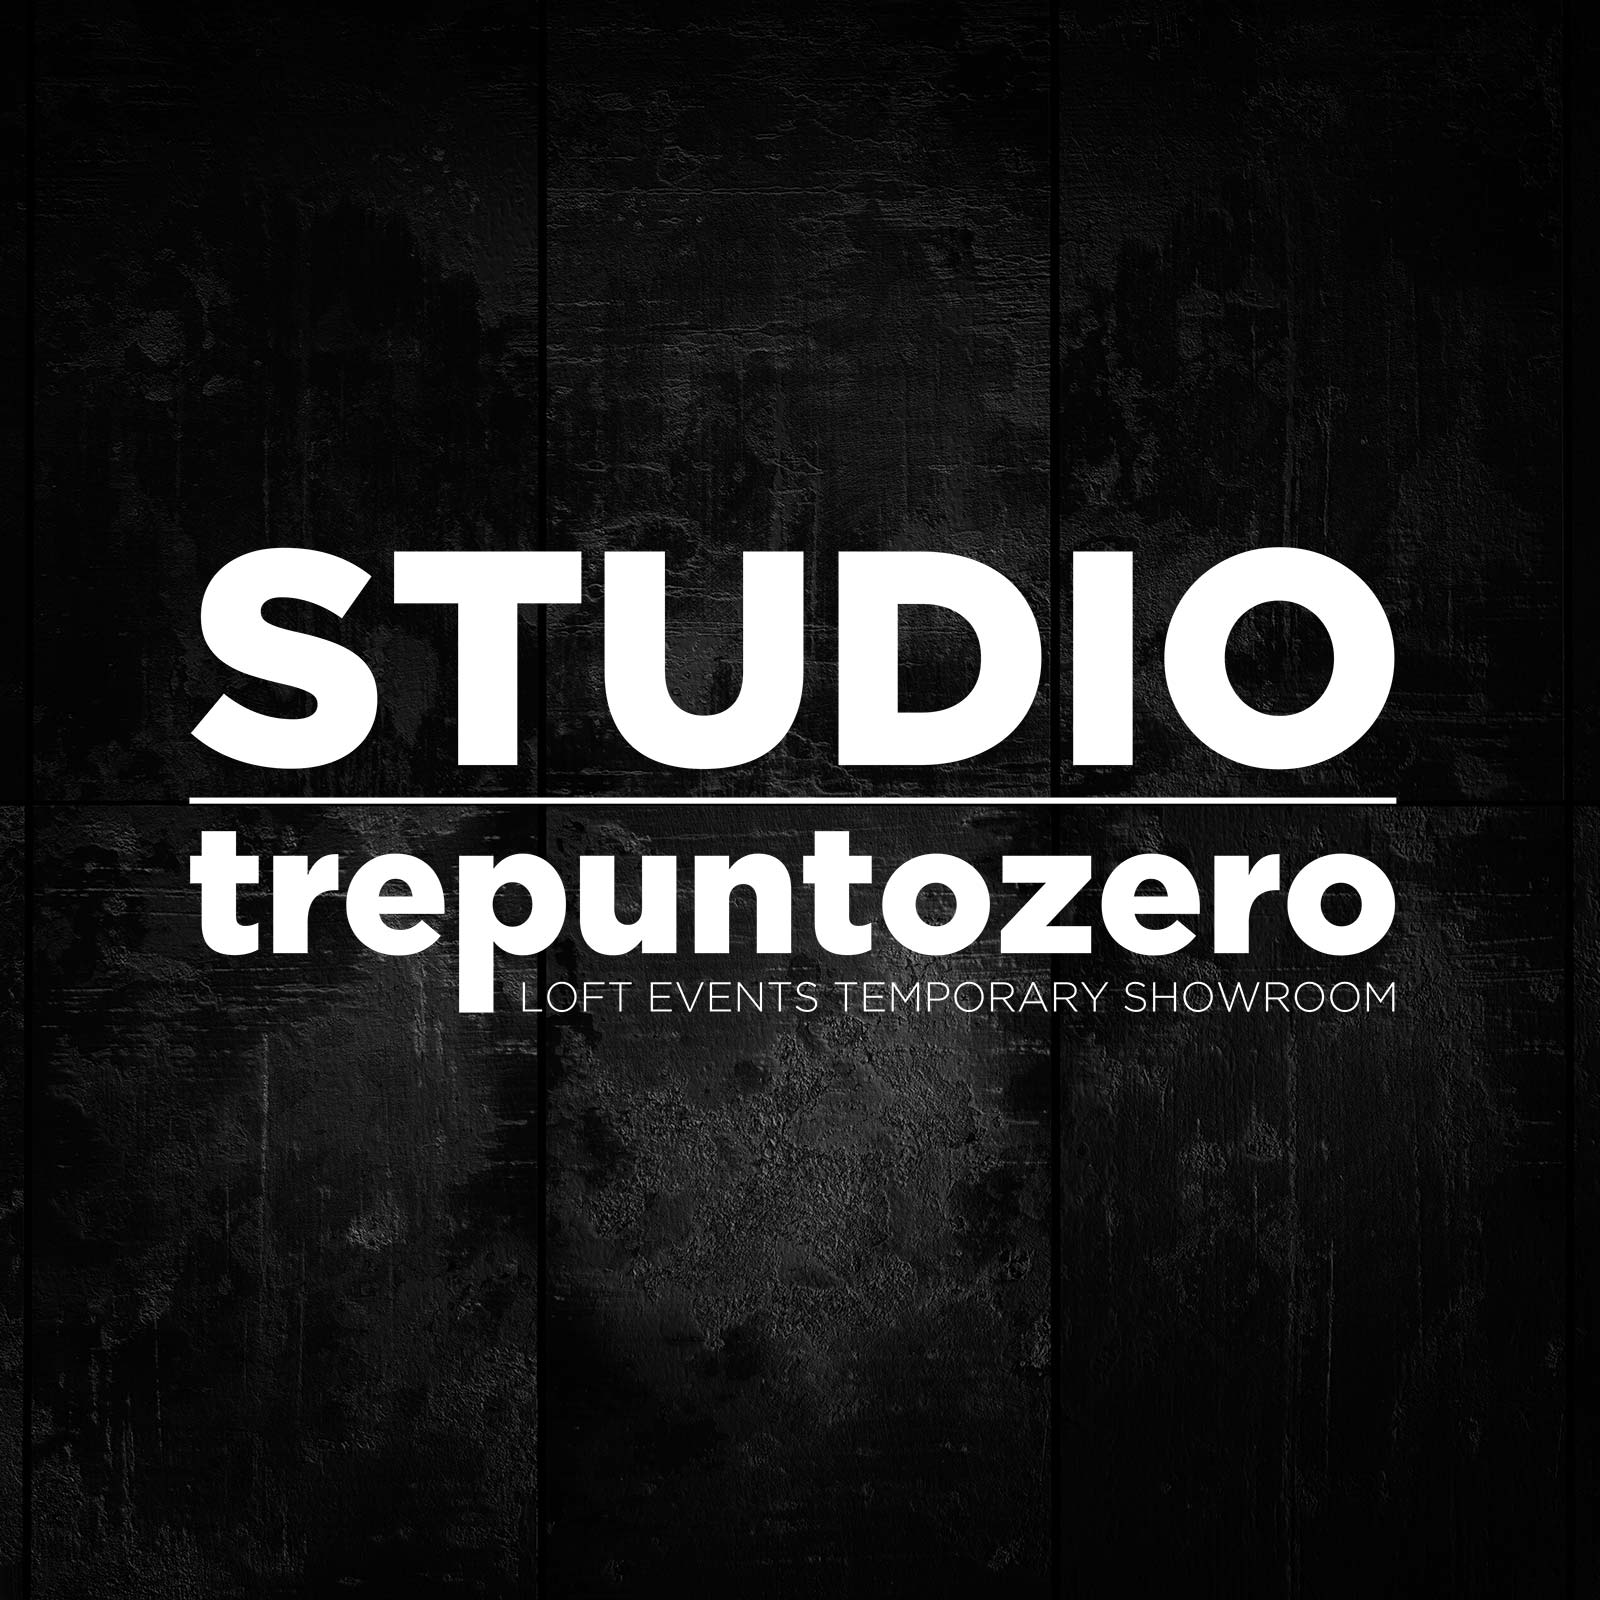 Logo Studiotrepuntozero